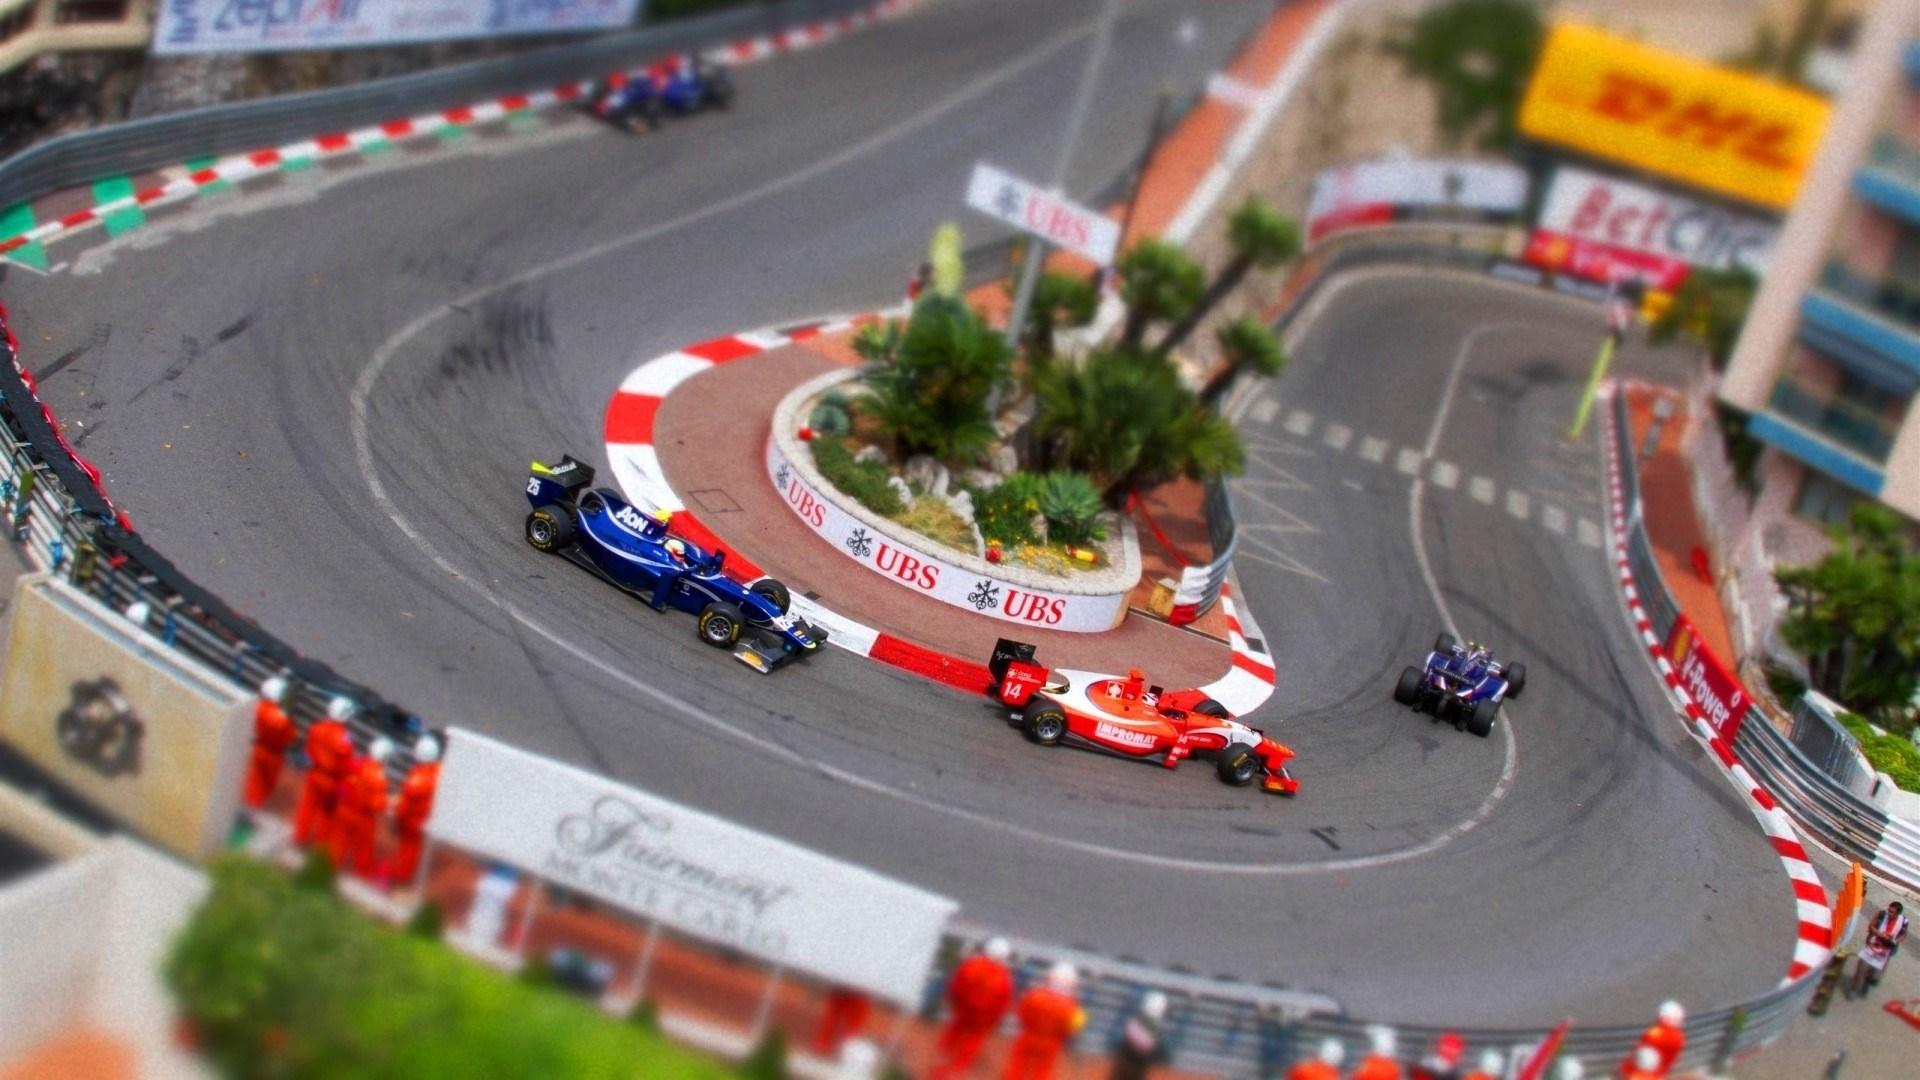 Cars Formula One Race